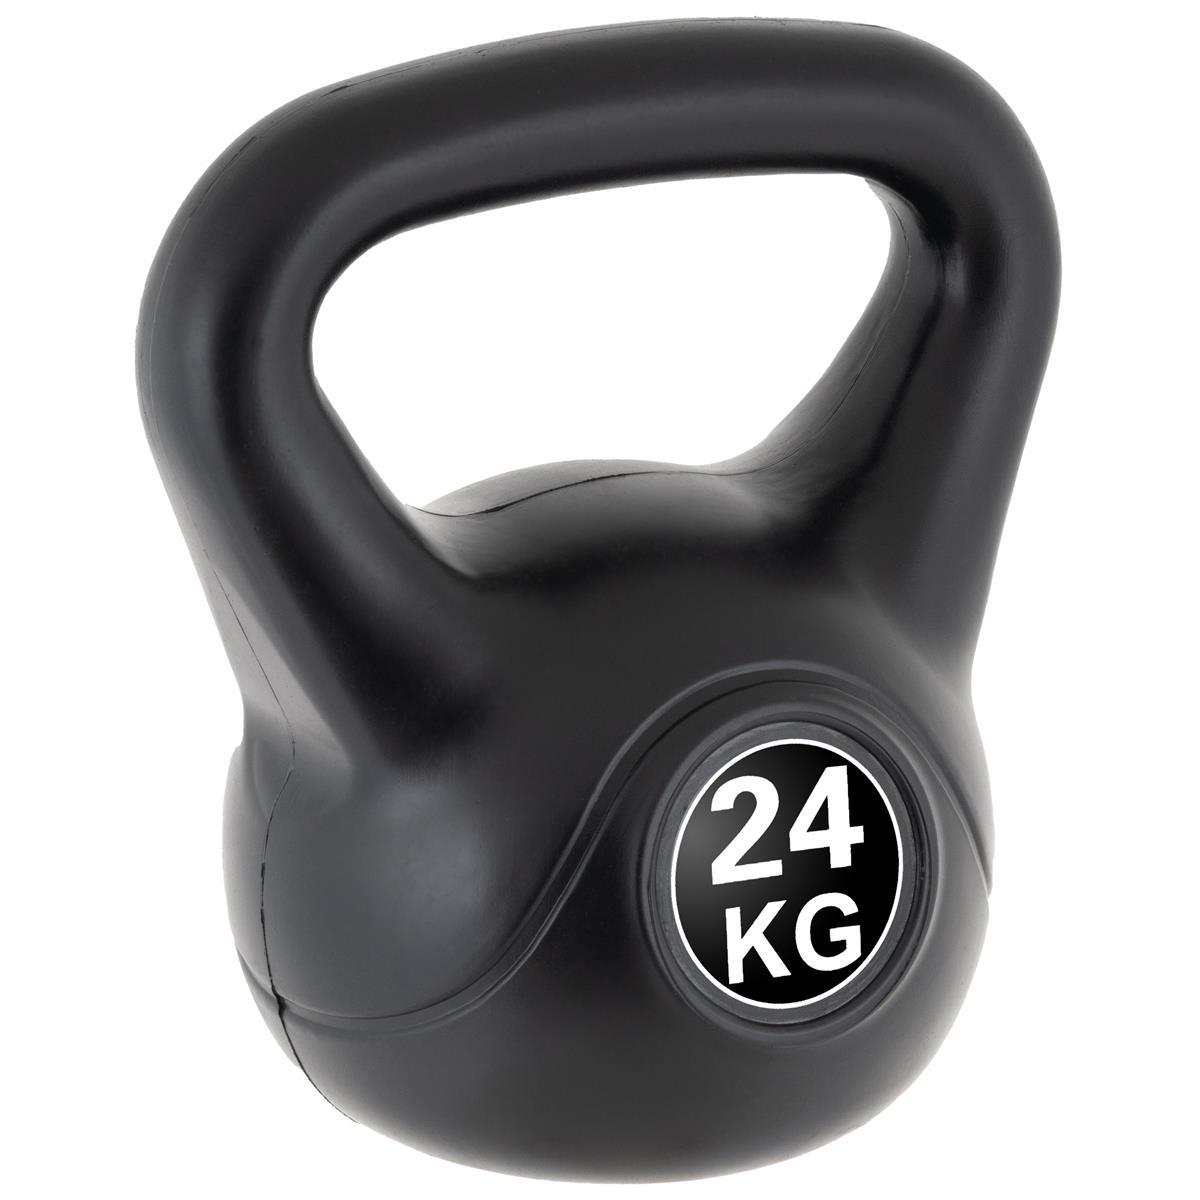 MAXXIVA Kettlebell Kugelhantel 24kg schwarz Krafttraining Fitness Rundhantel